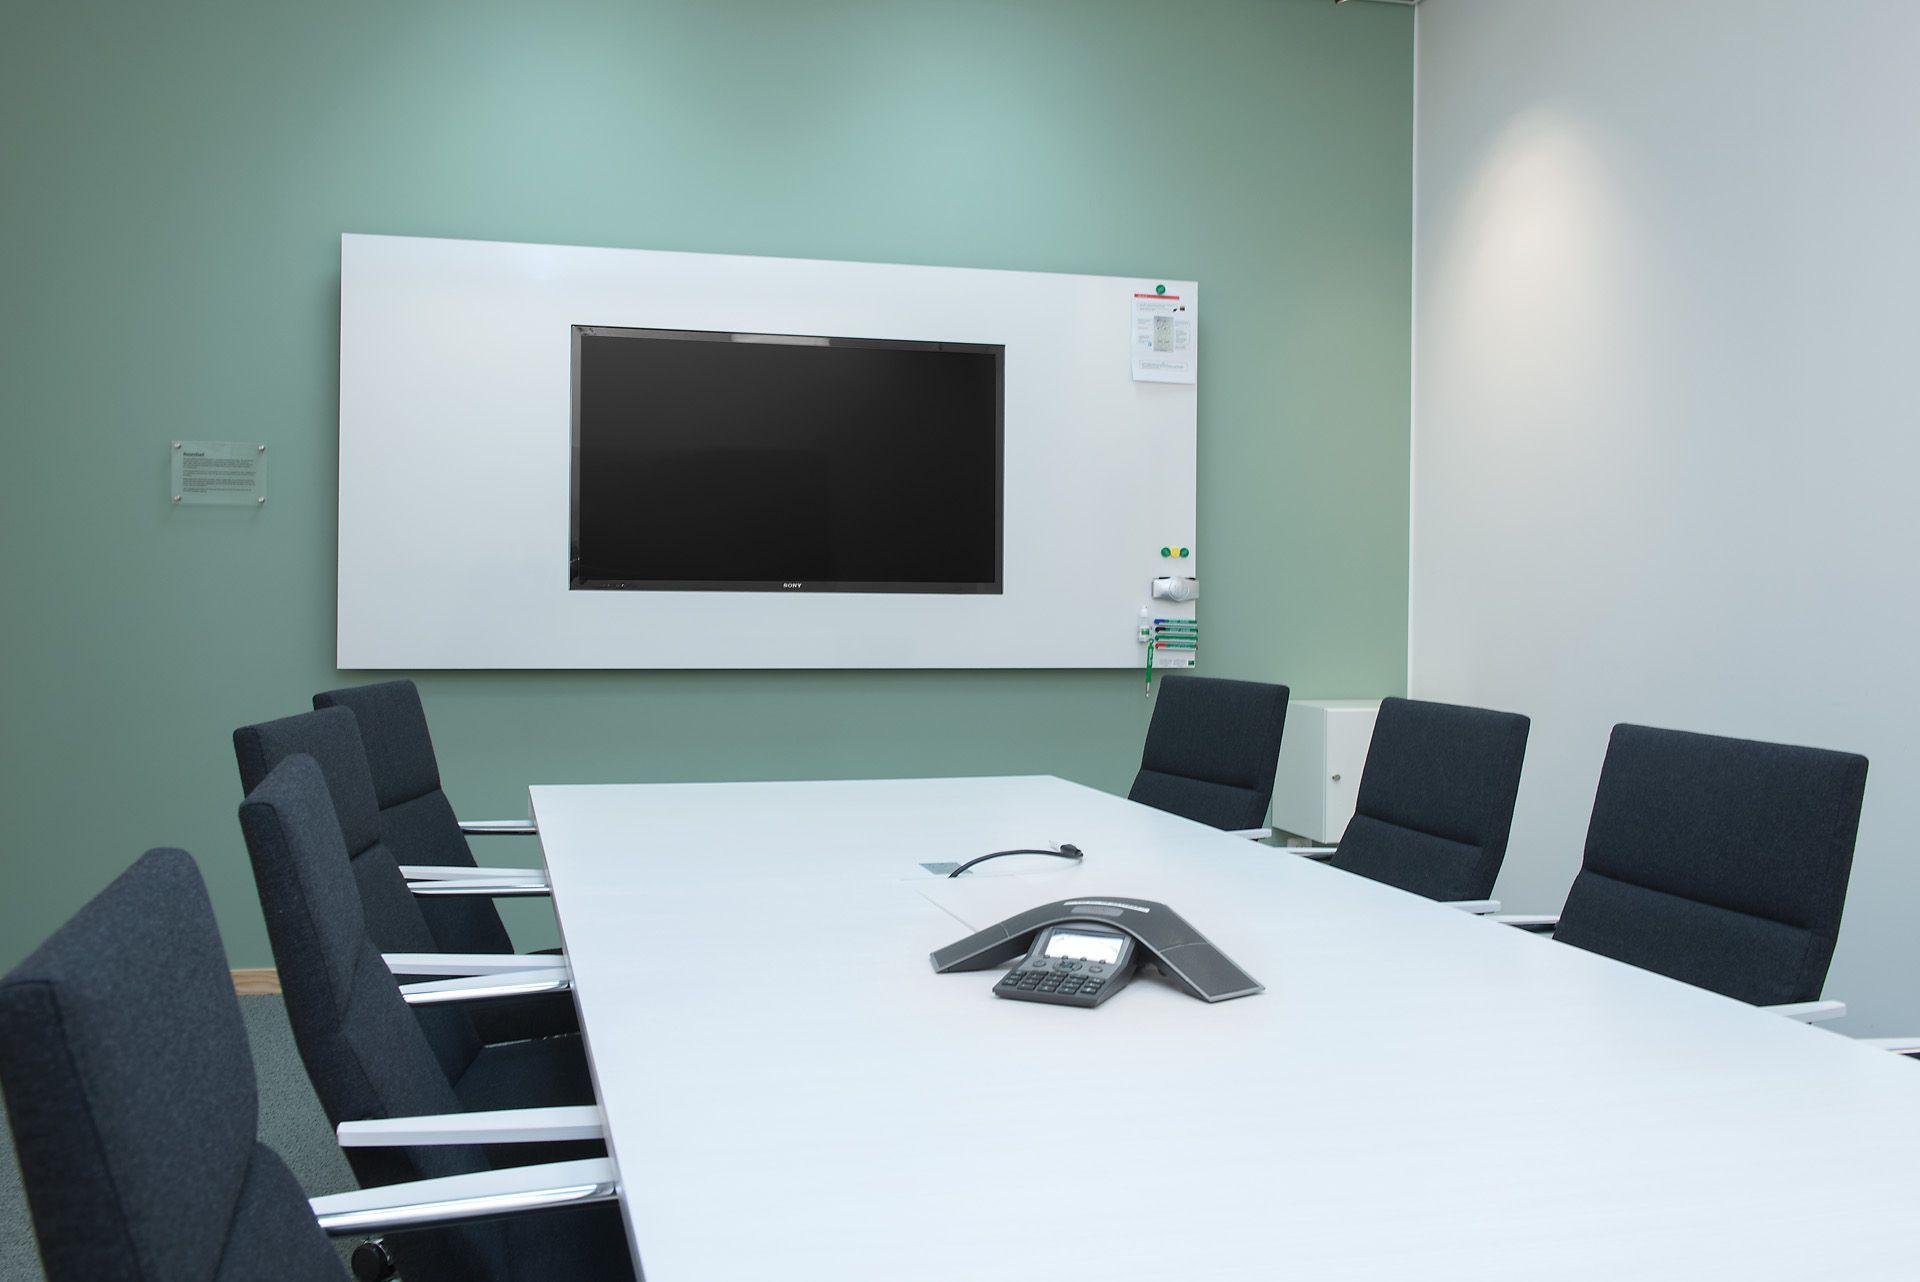 Pin Pa Motesrum Kontor Skola Utbildning Konferensrum Design Teknik Meeting Room Interior Design Digital Meetings Conference Room